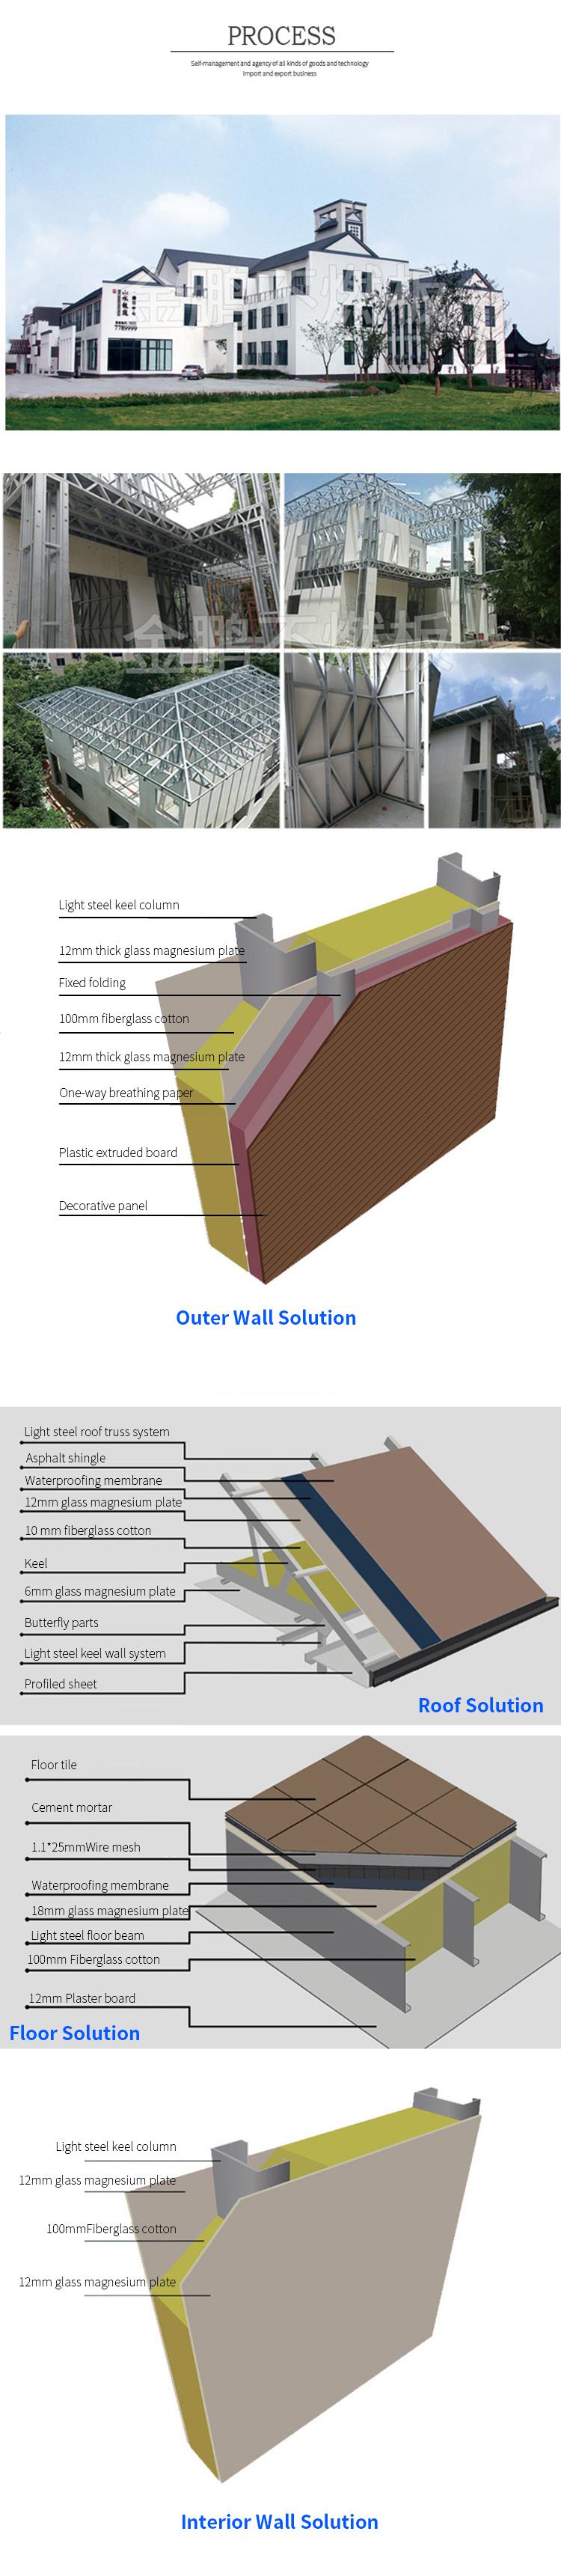 Mgo Board Pvc Wall Decorative Panel Xps Mgo Board Sandwich Panel - Buy Wall  Decorative Panel,Mgo Board Pvc,Xps Mgo Board Sandwich Panel Product on ...